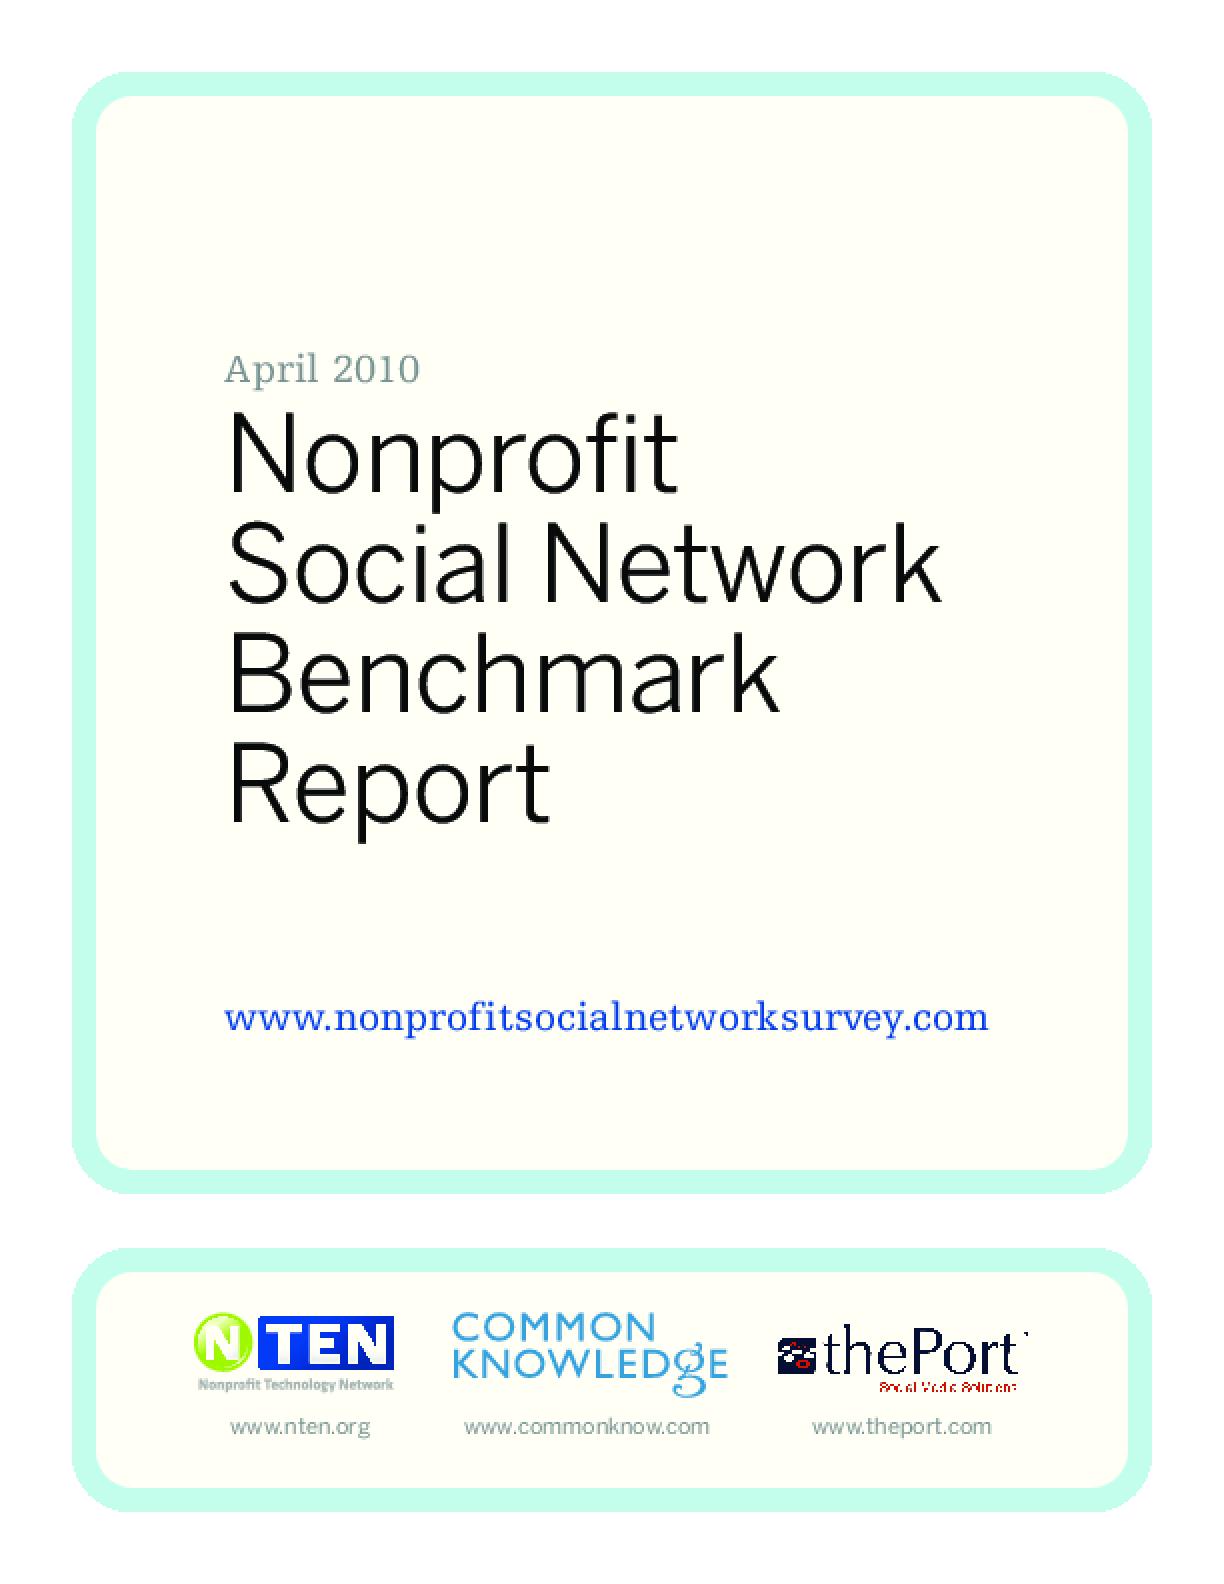 Nonprofit Social Network Benchmark Report